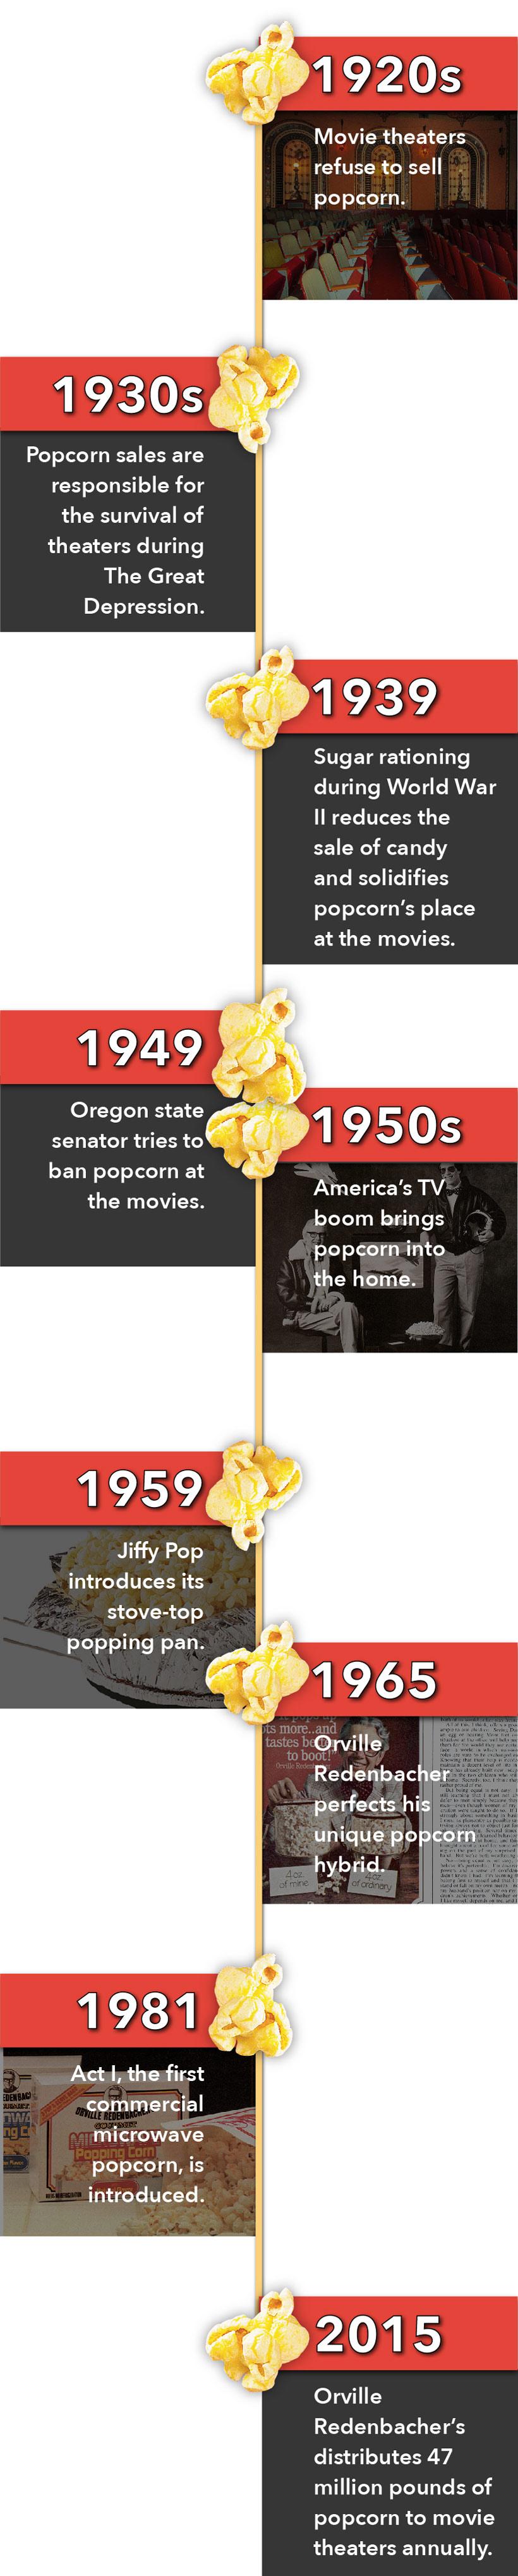 Timeline---history-of-popcorn-at-movie-theatre-04.jpg